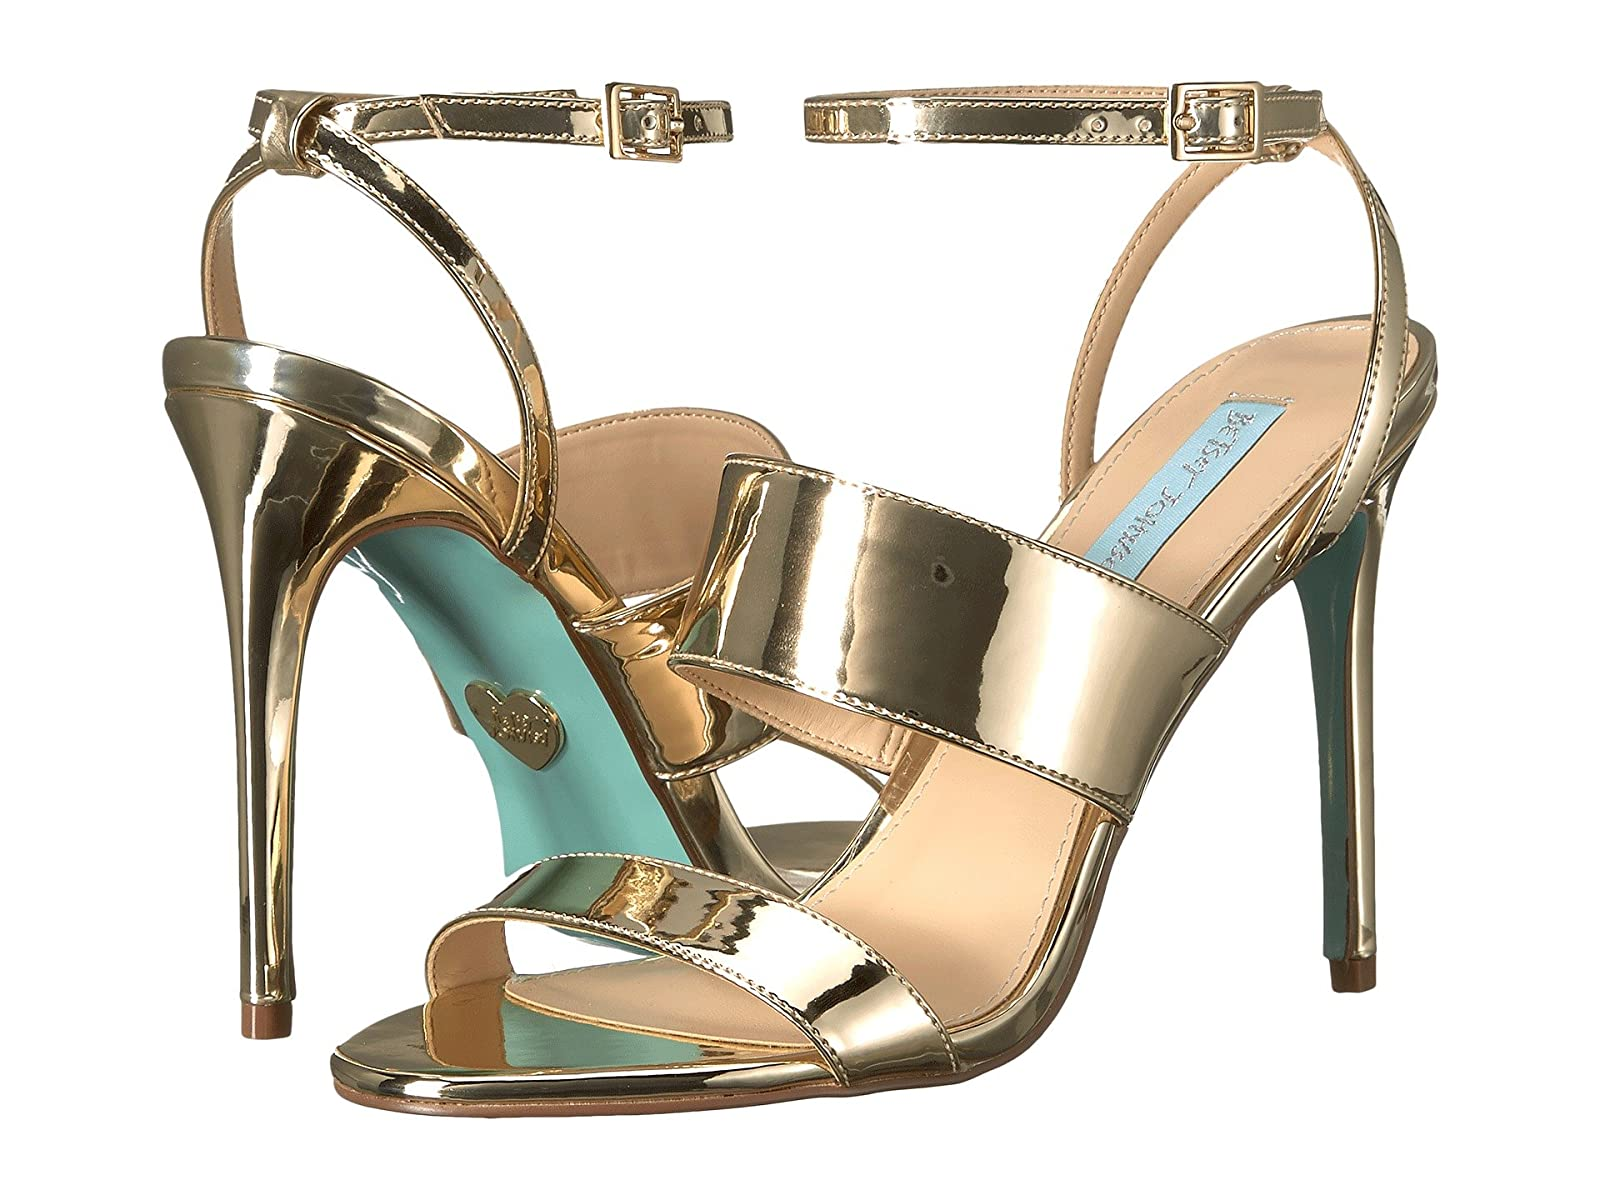 Blue by Betsey Johnson JennaCheap and distinctive eye-catching shoes